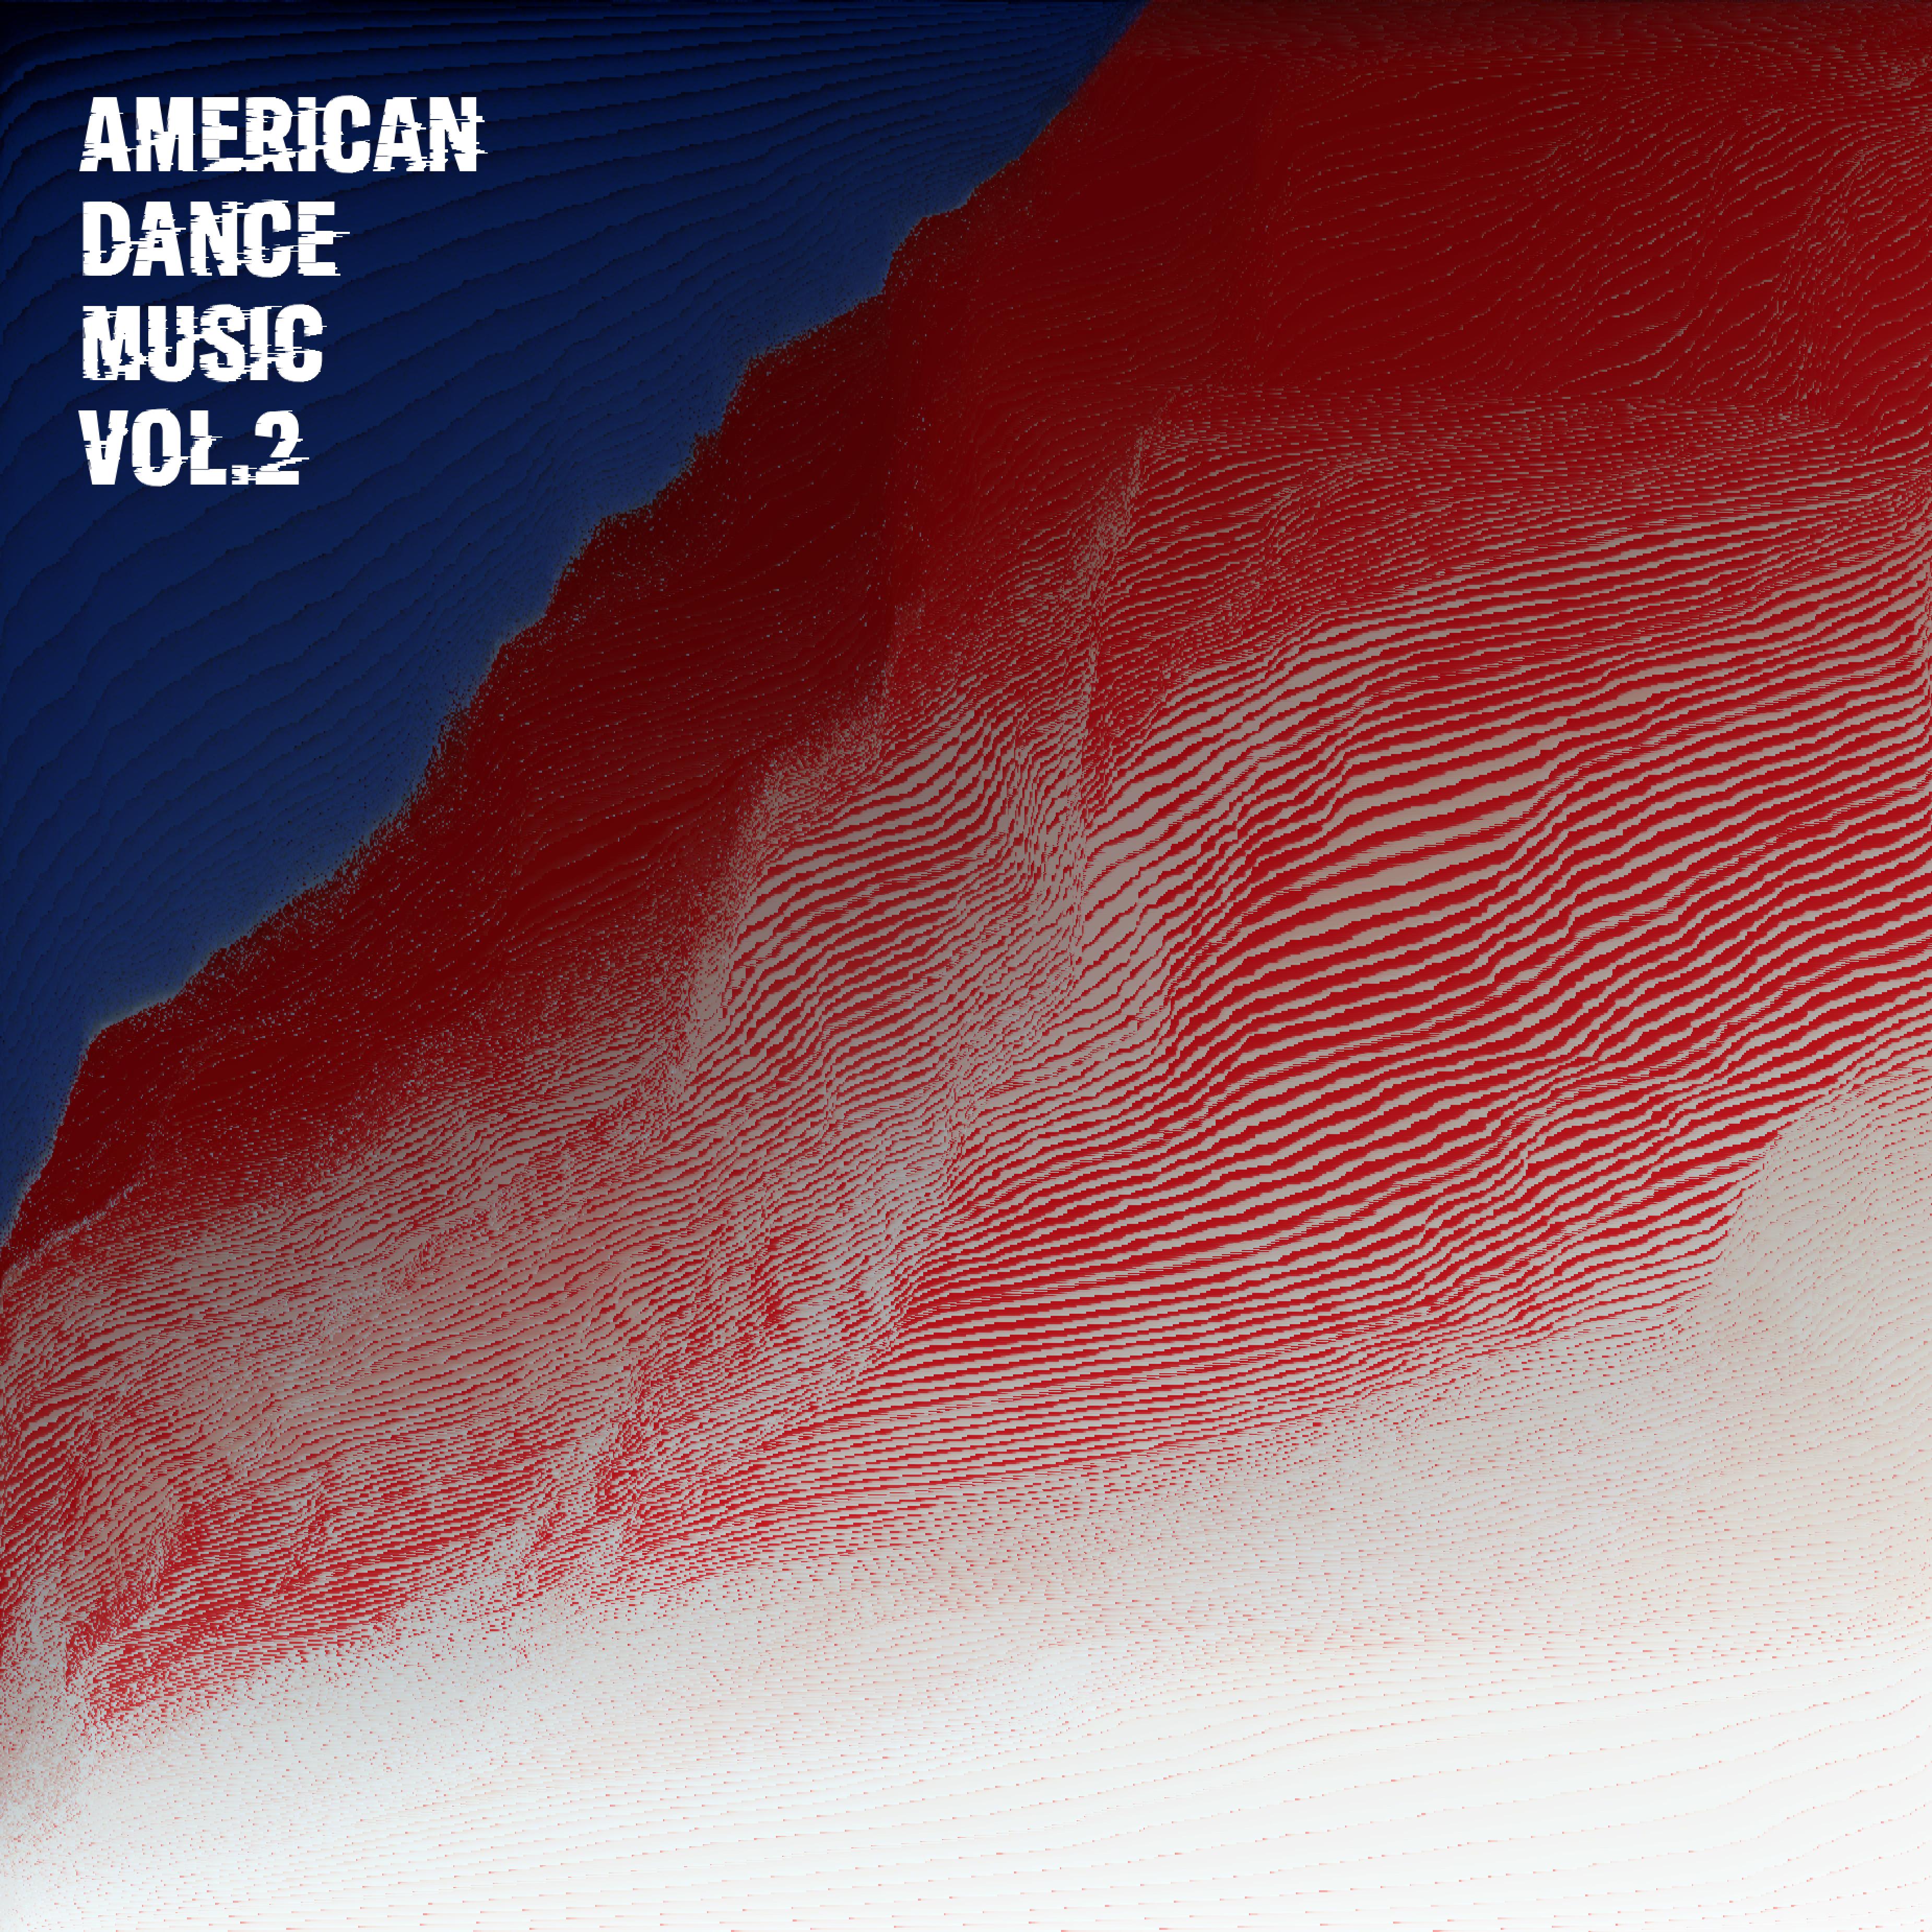 American Dance Music Vol. 2